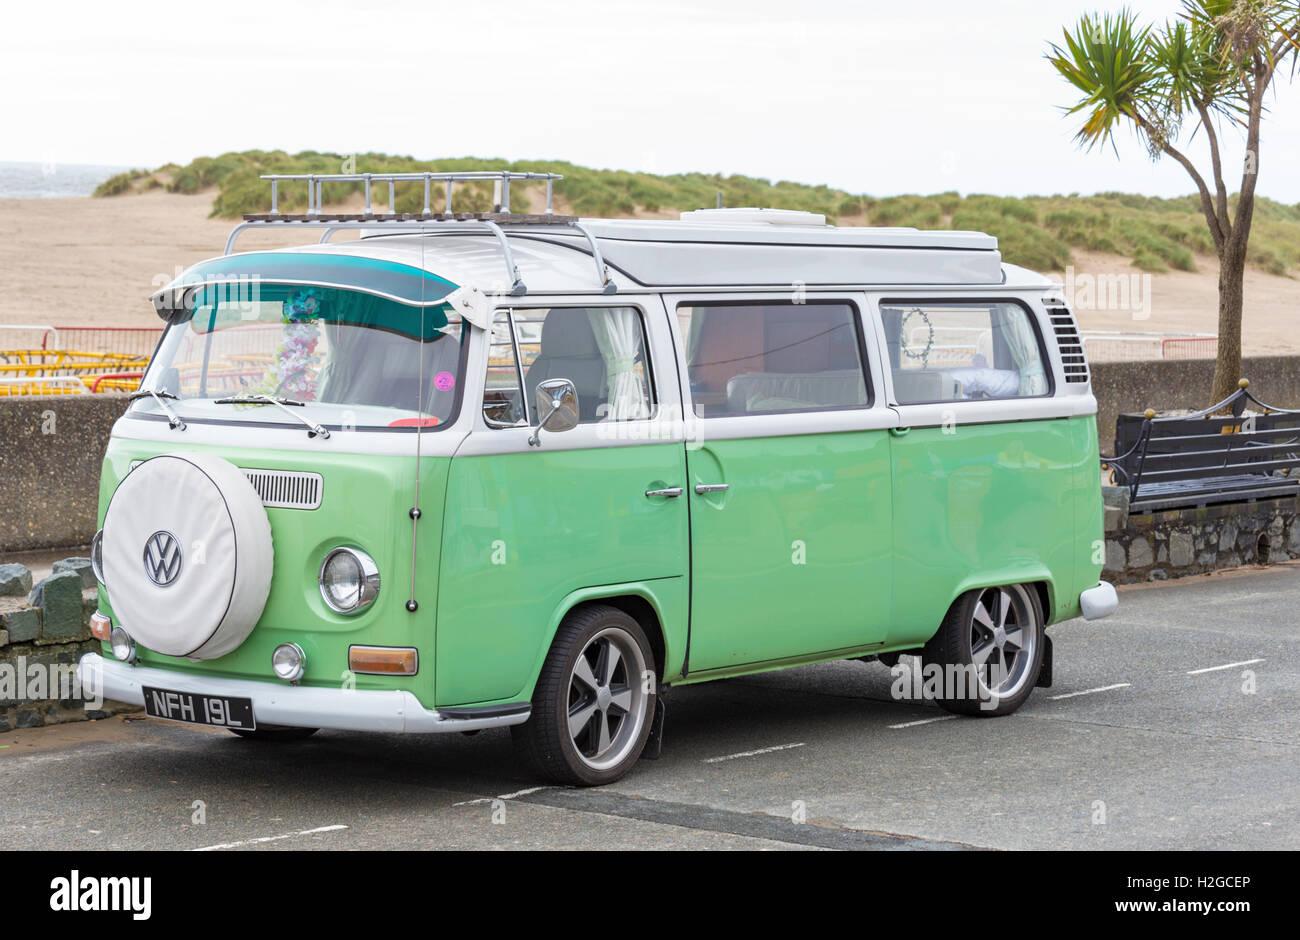 Volkswagen campervan at a British seaside resort. - Stock Image